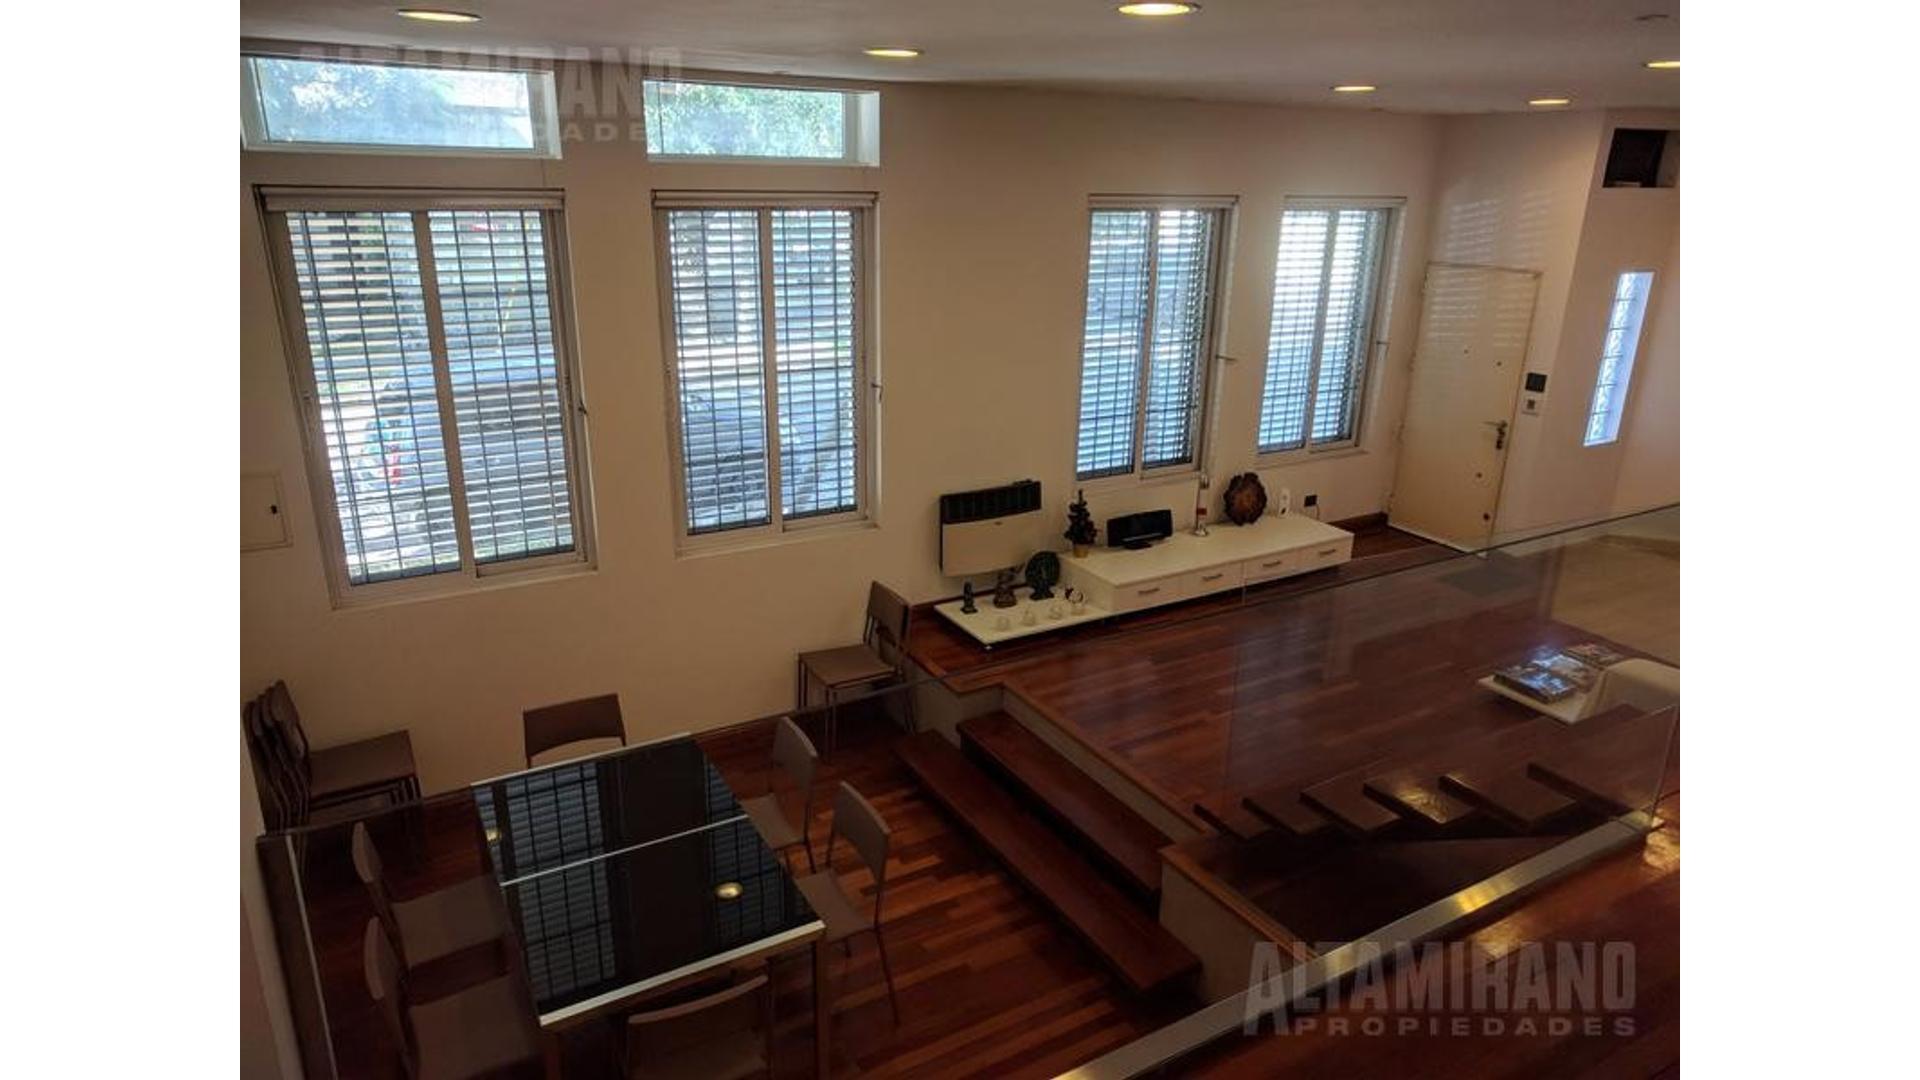 PH - Villa Adelina P/h tipo loft impecable, excelente categoría!